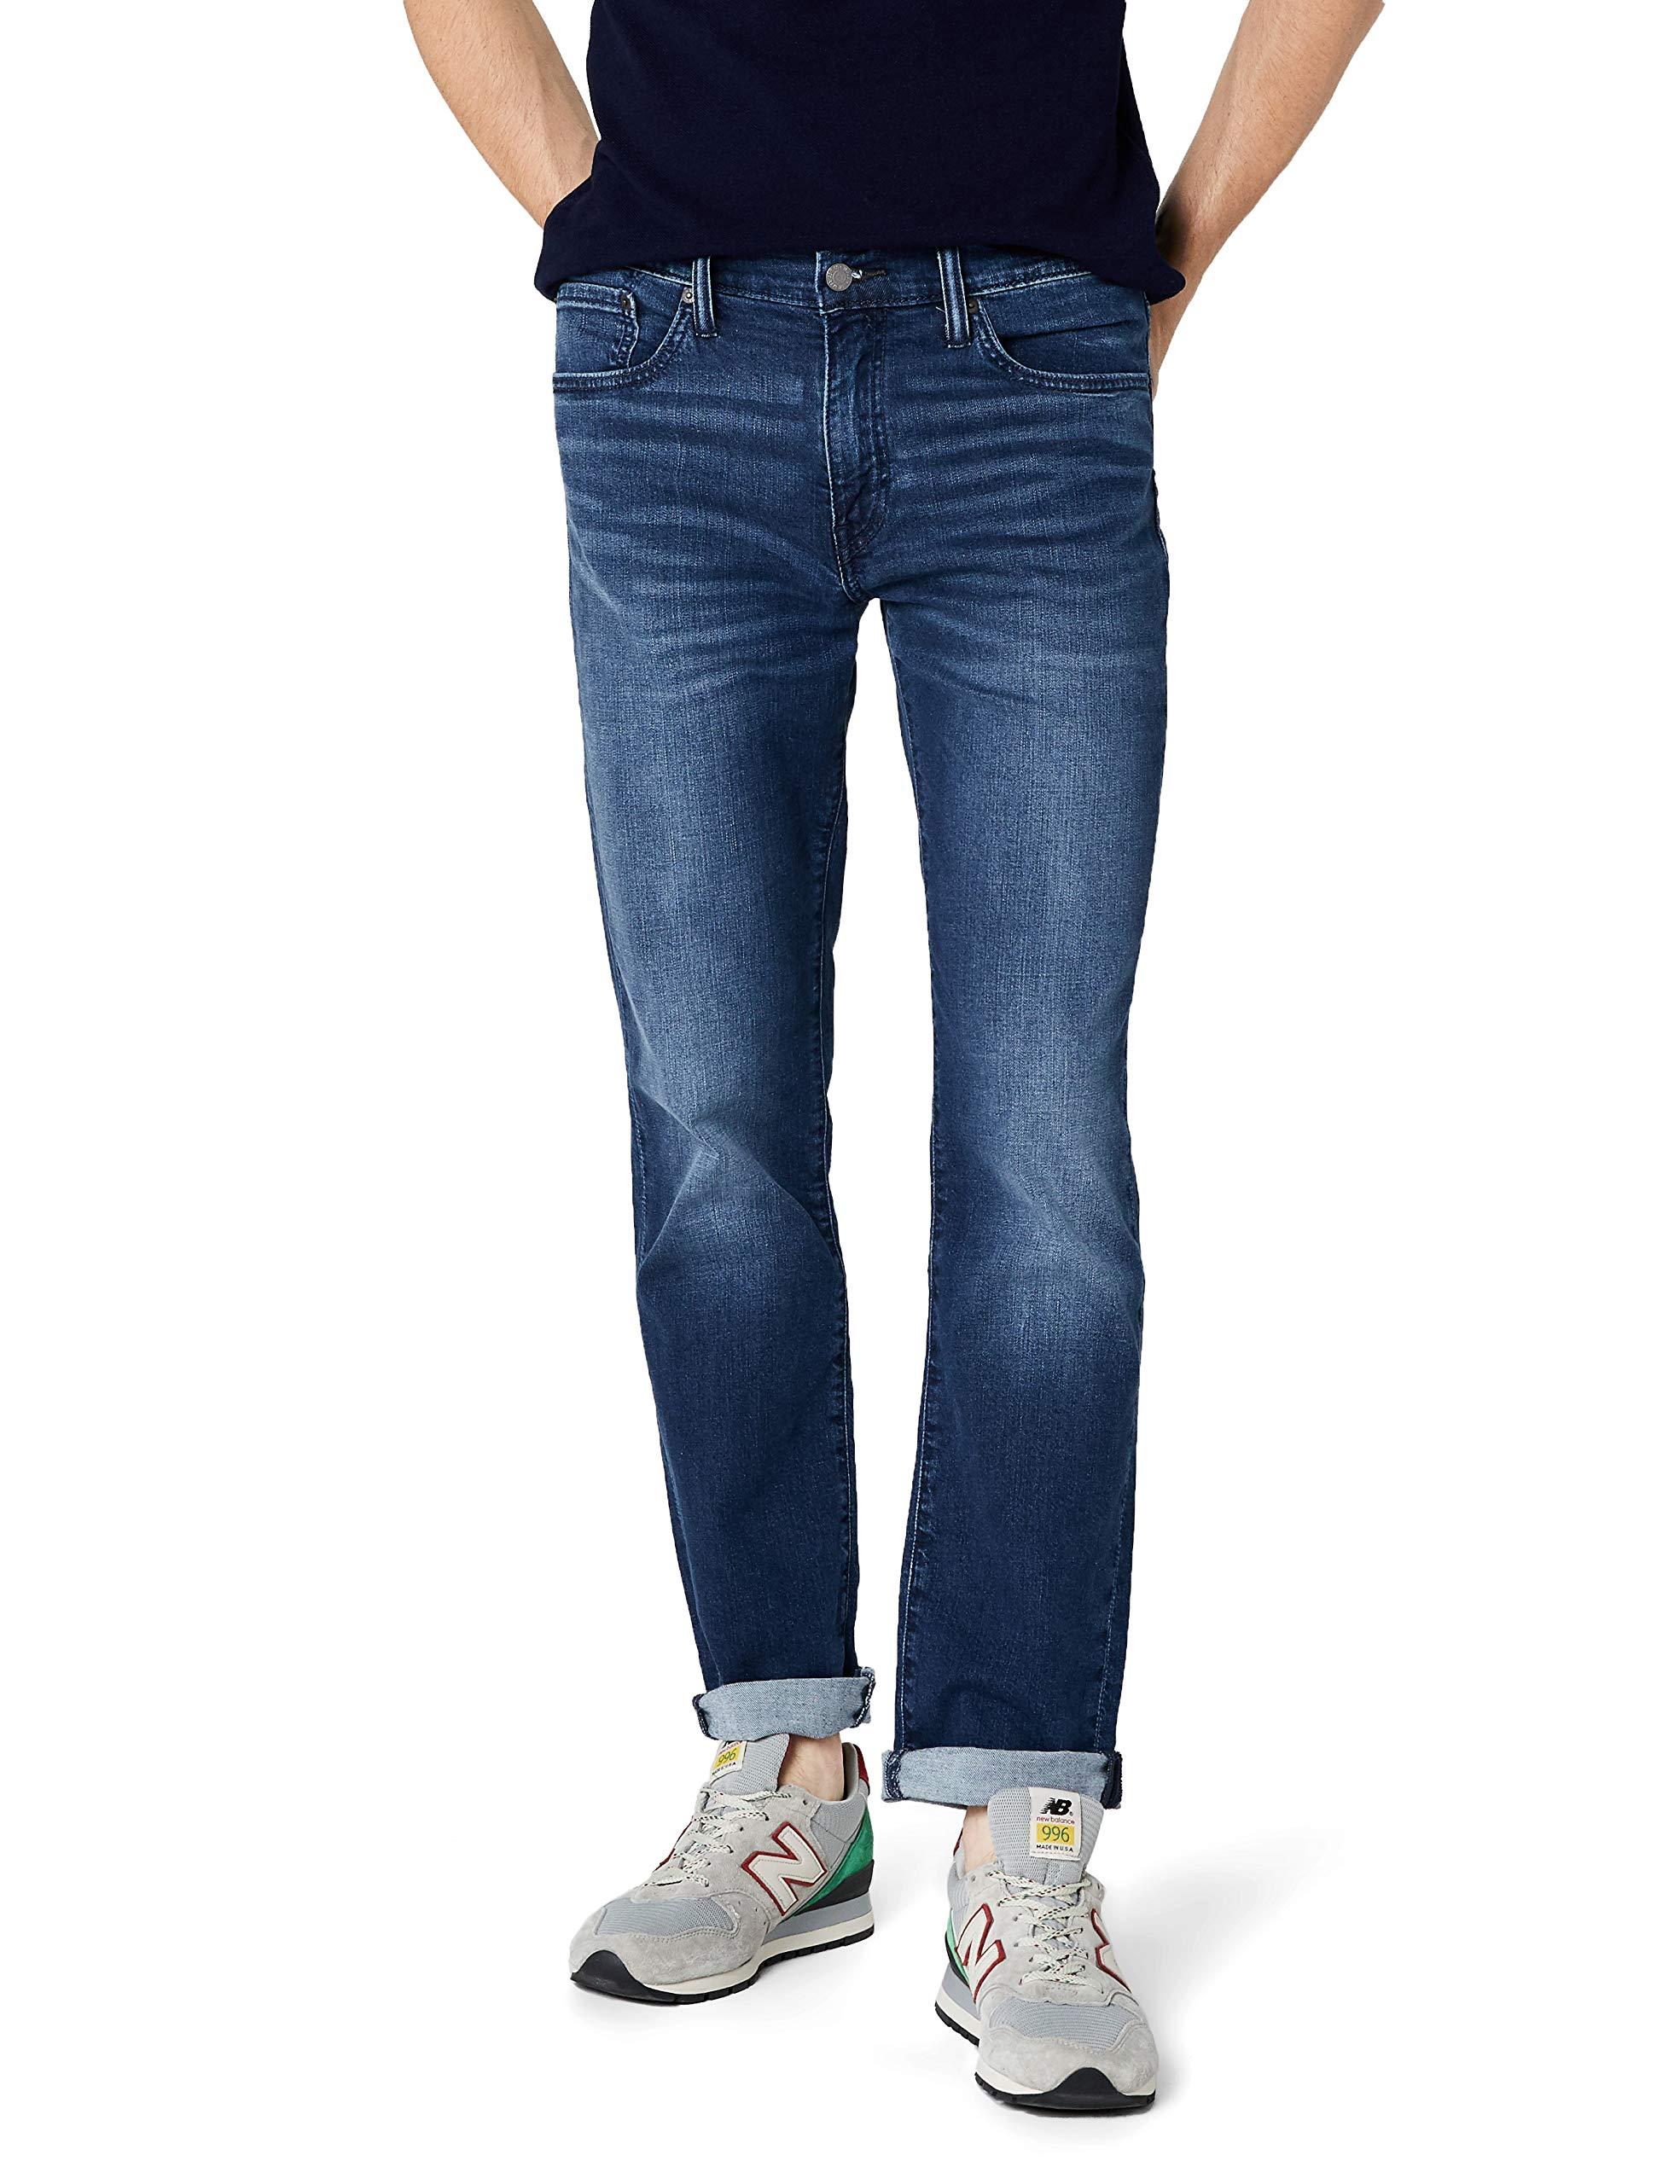 04a3273429d Levi s Herren Jeans 511 Slim Fit